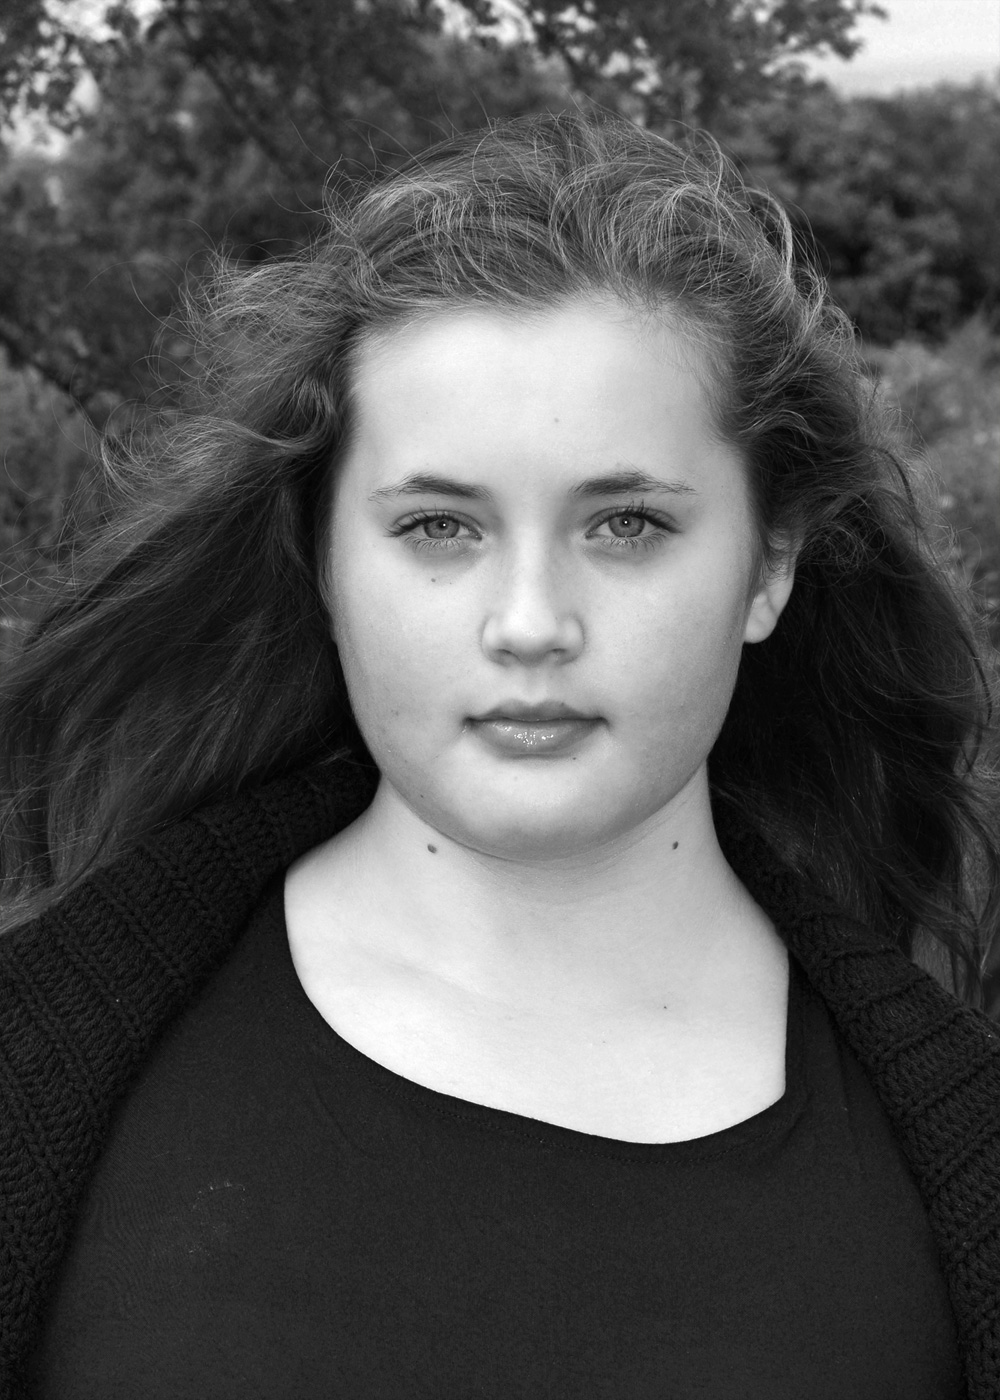 Sophia-M-2015-22-black-and-white